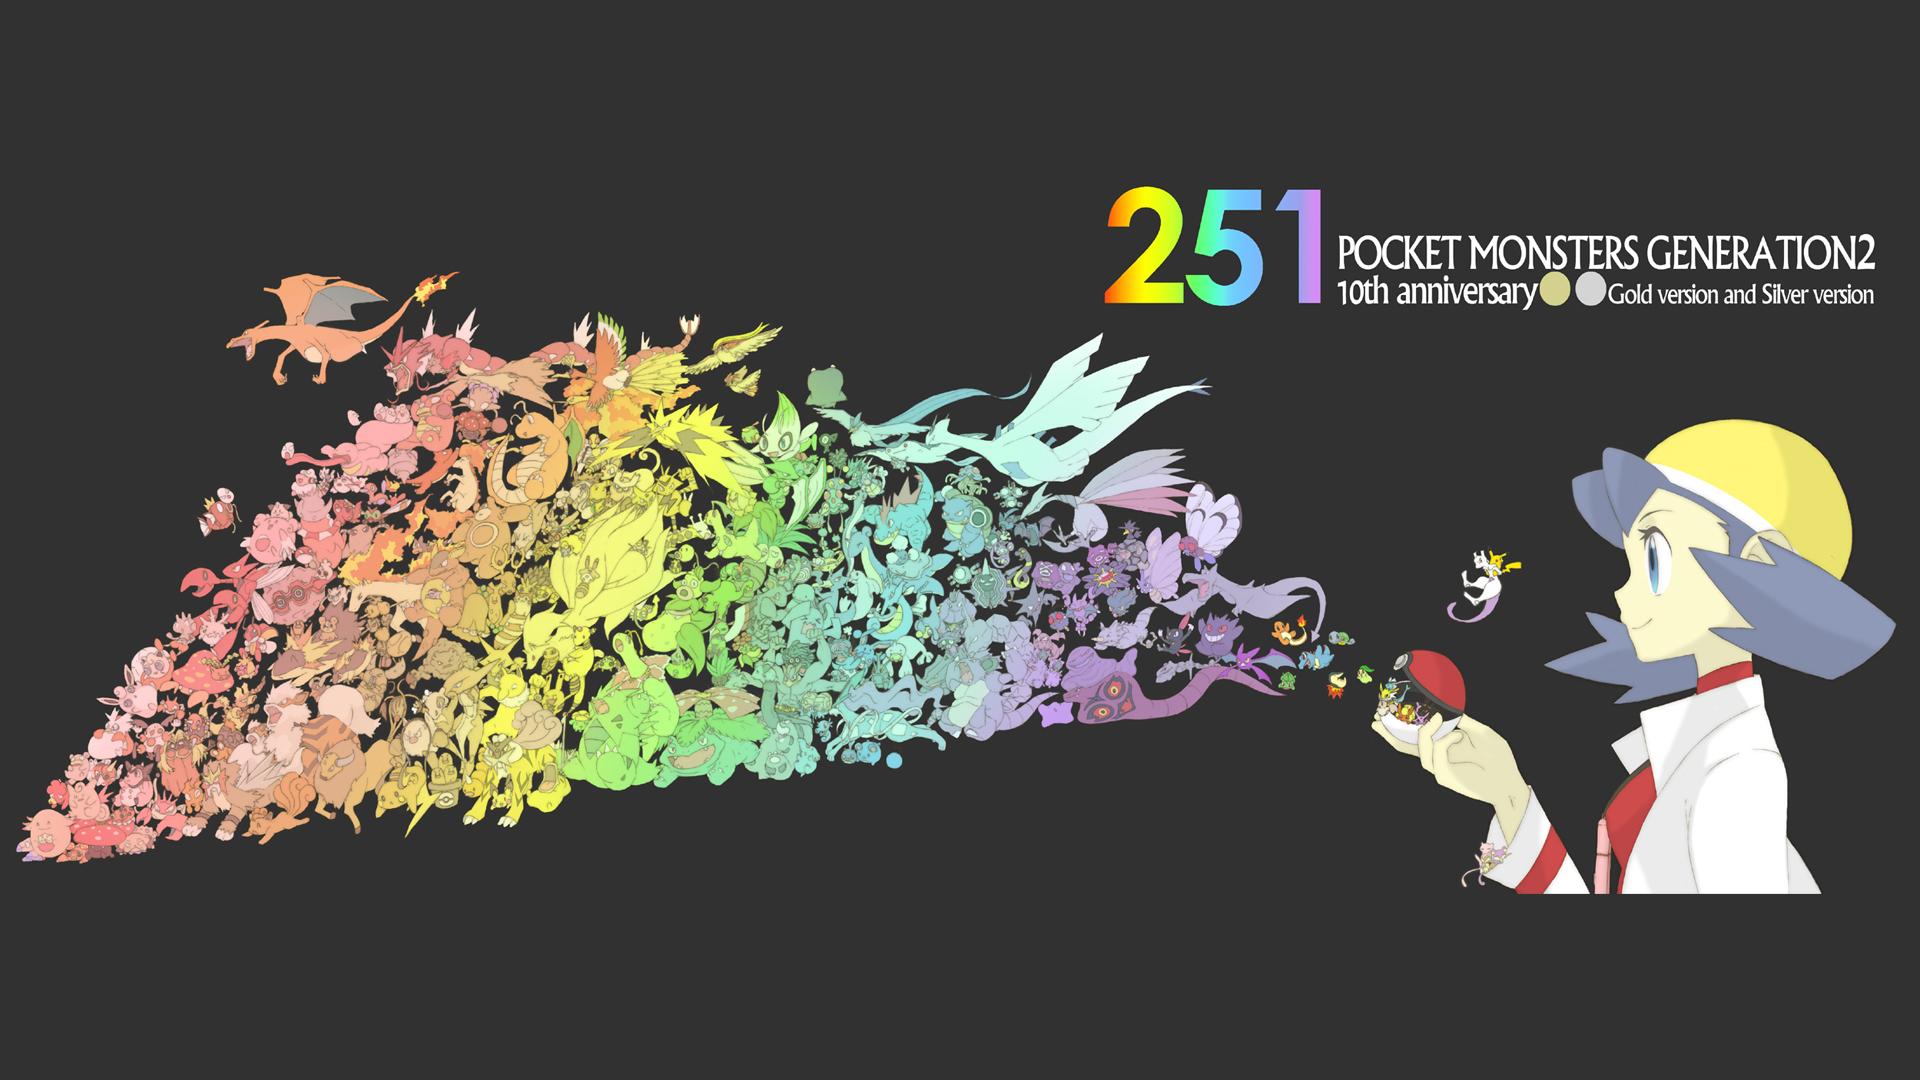 Cartoon Pokemon Wallpaper ImageBankbiz 1920x1080